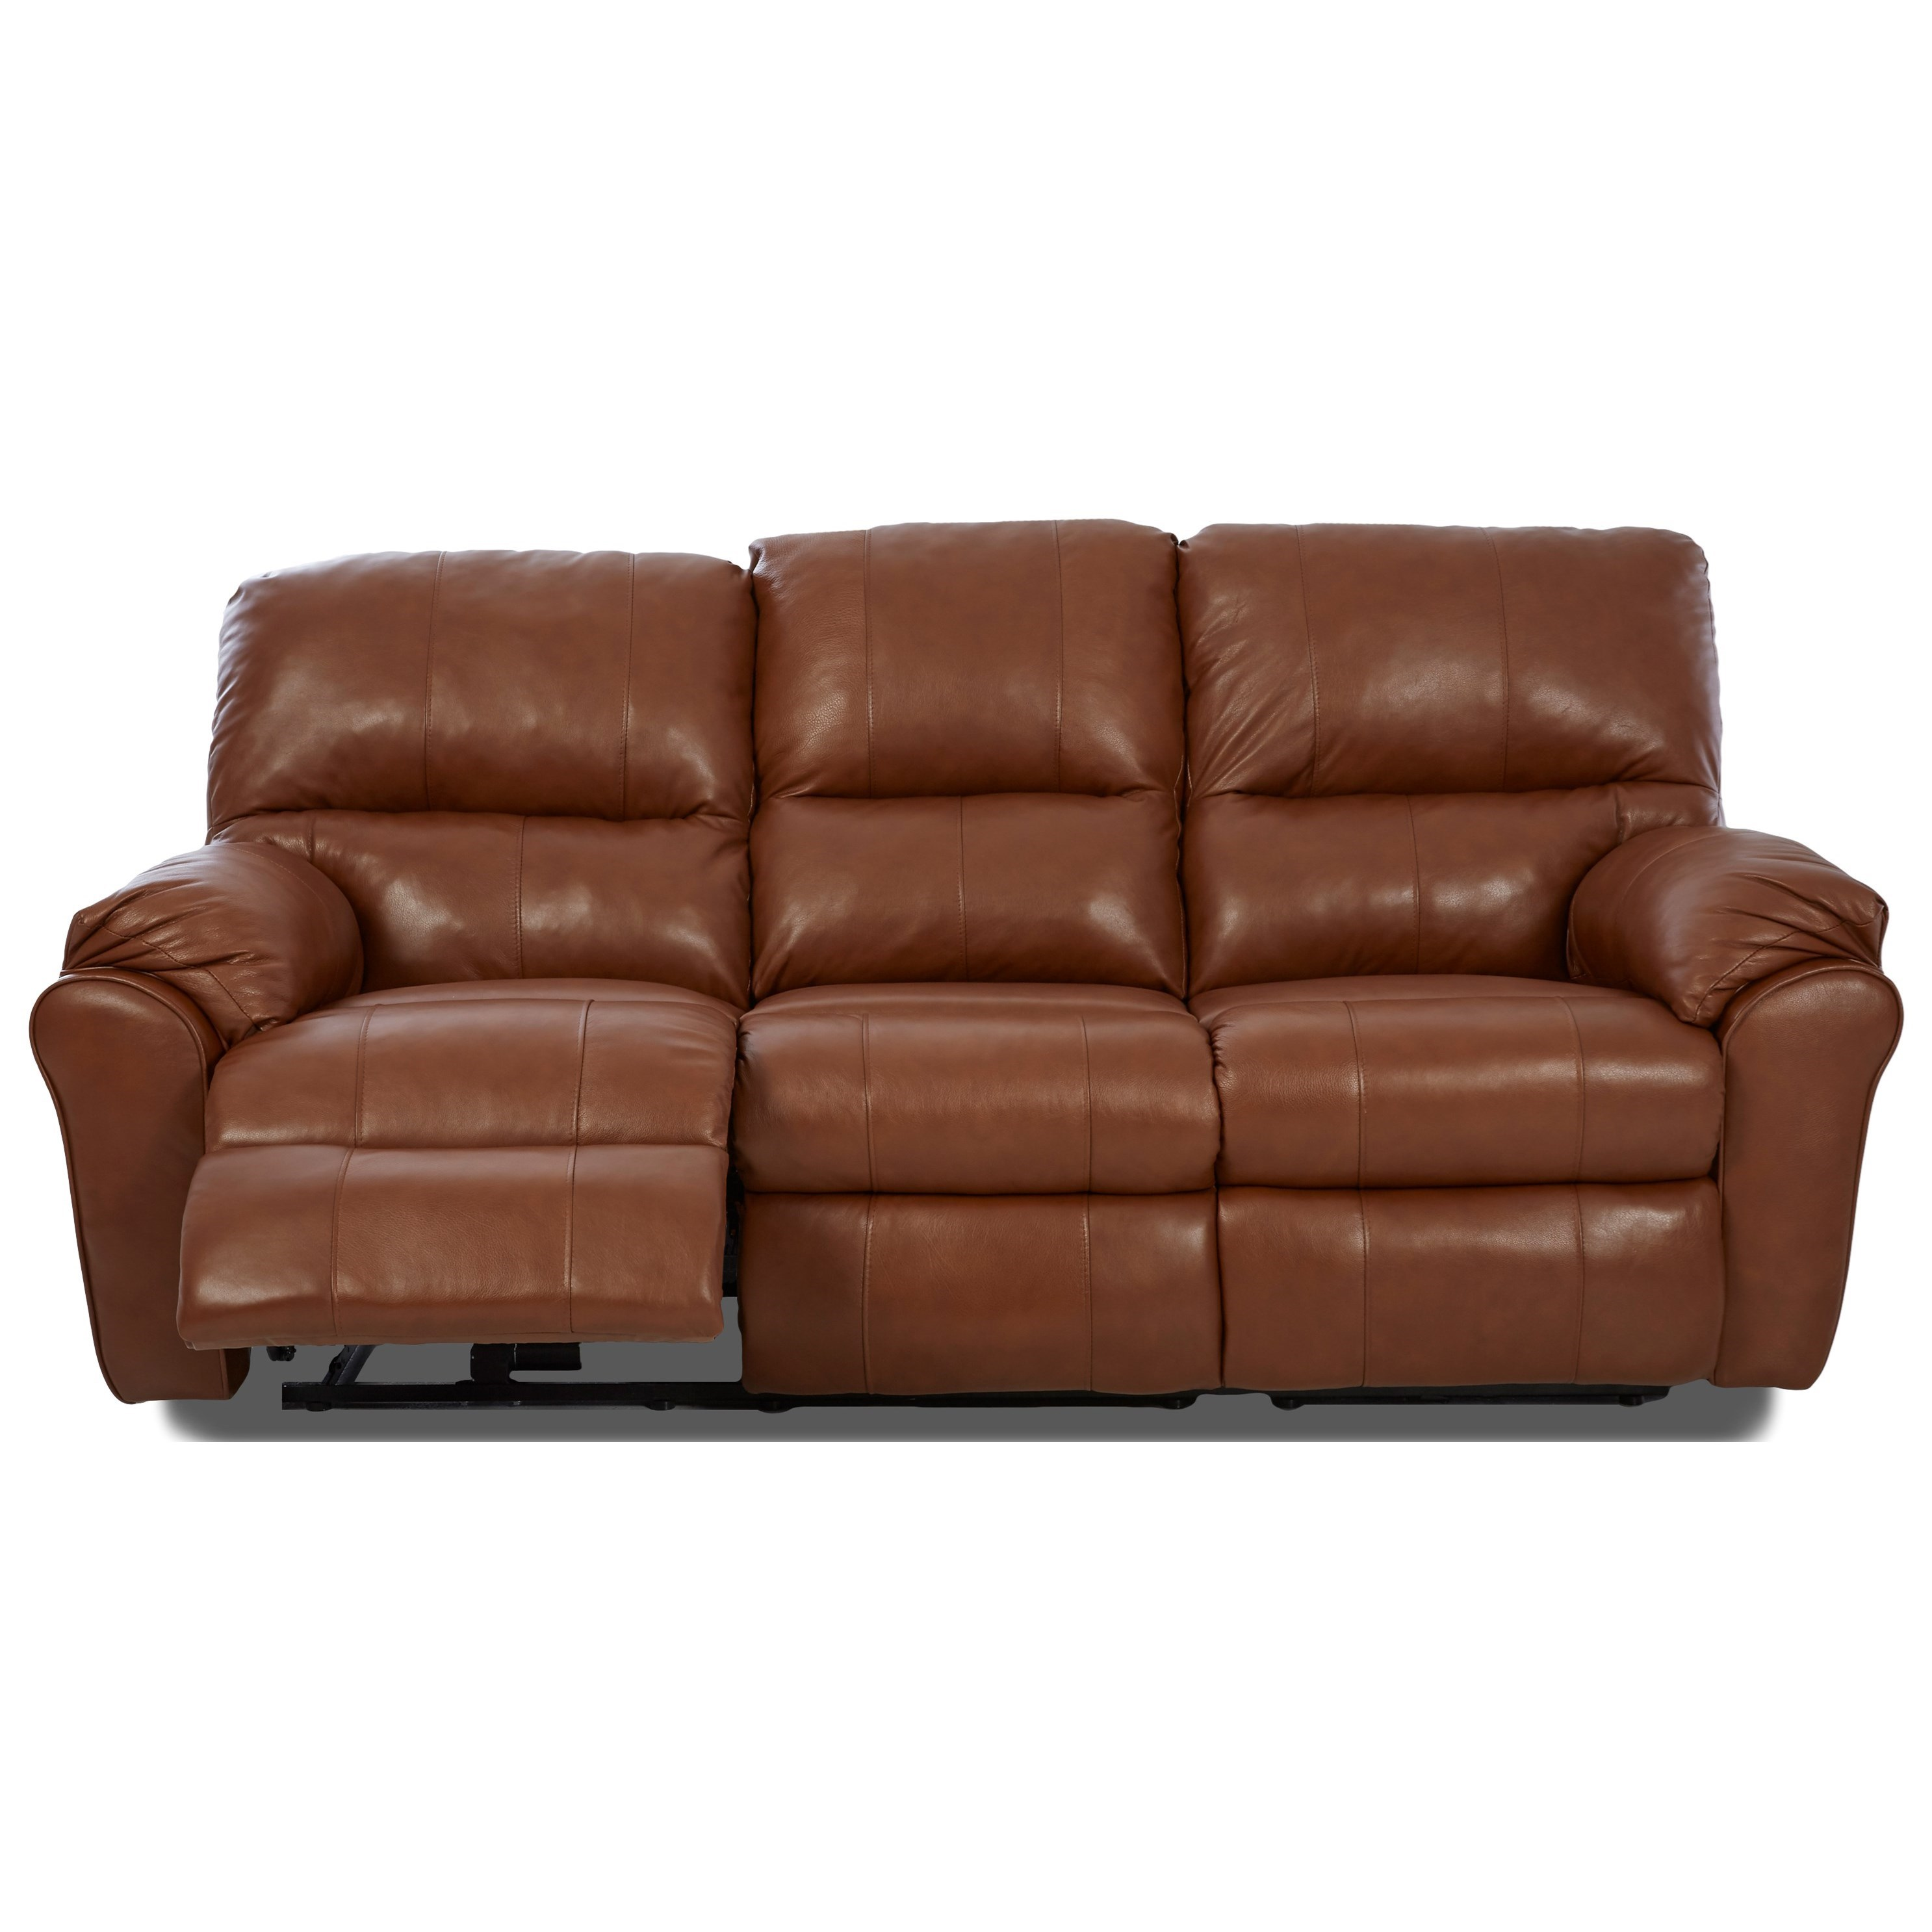 Klaussner Bateman Casual Reclining Sofa With 2 Power